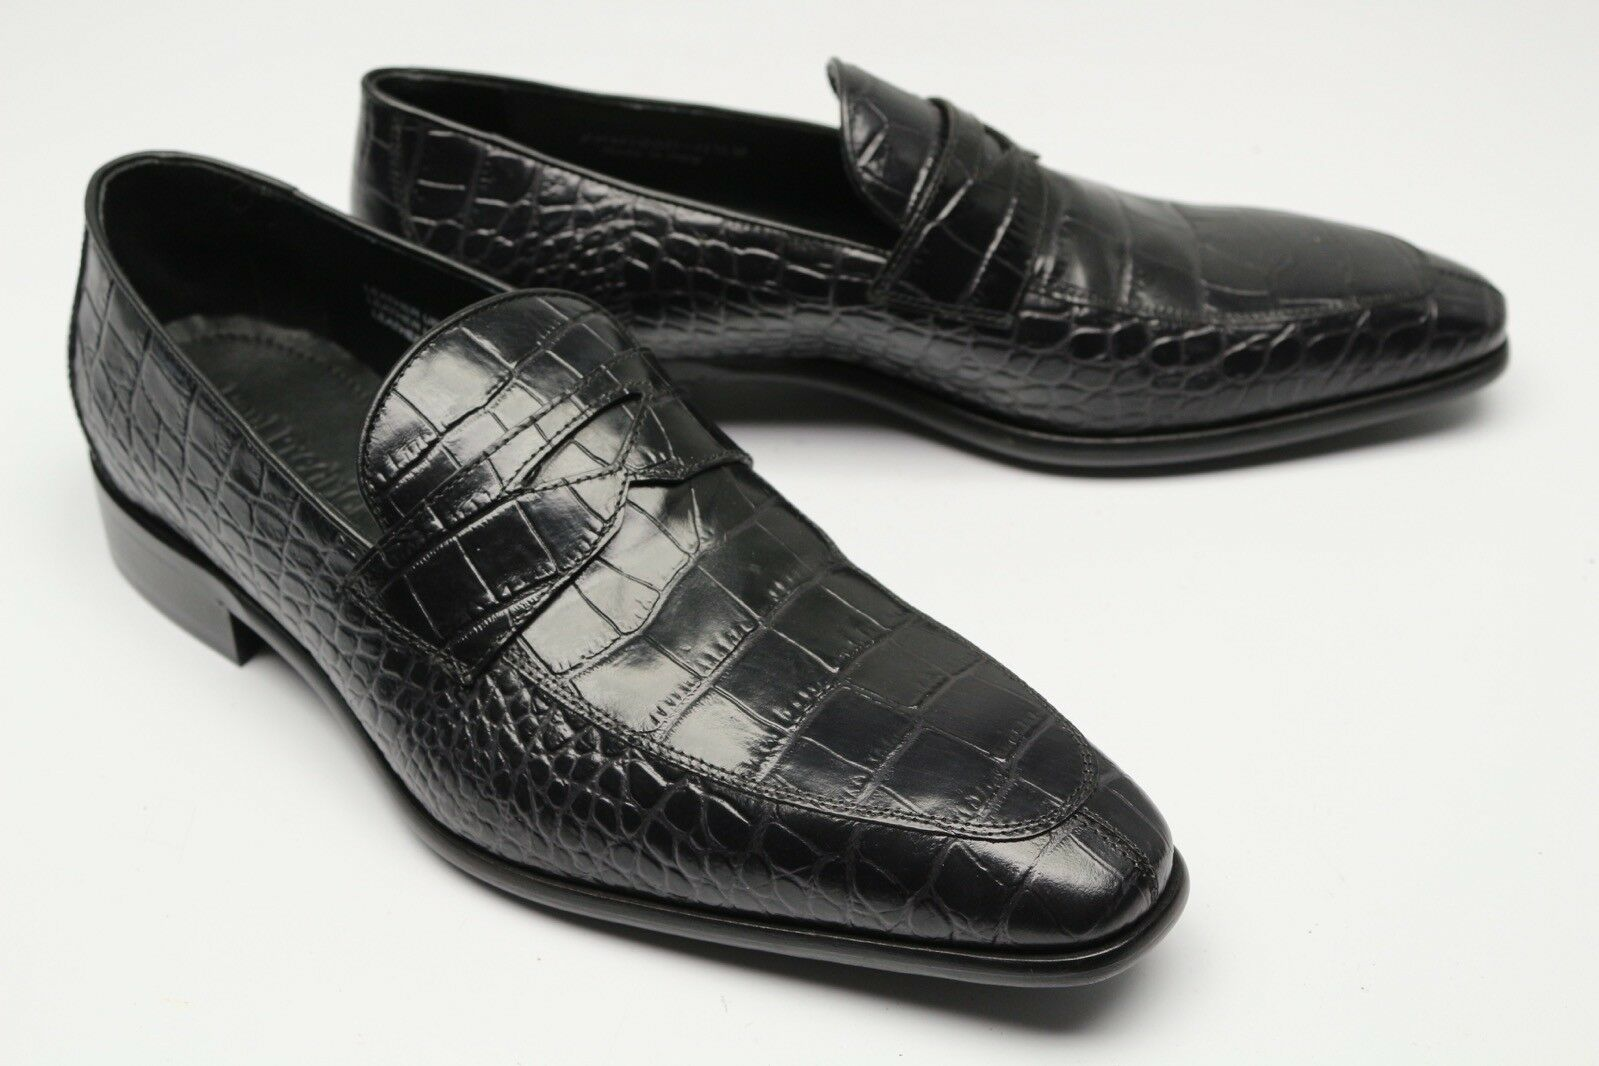 Neu Paul Frotrick Krokodil-Aufdruck Pennyloafer 11.5  Schwarze Lederschuhe     Verschiedene Arten und Stile